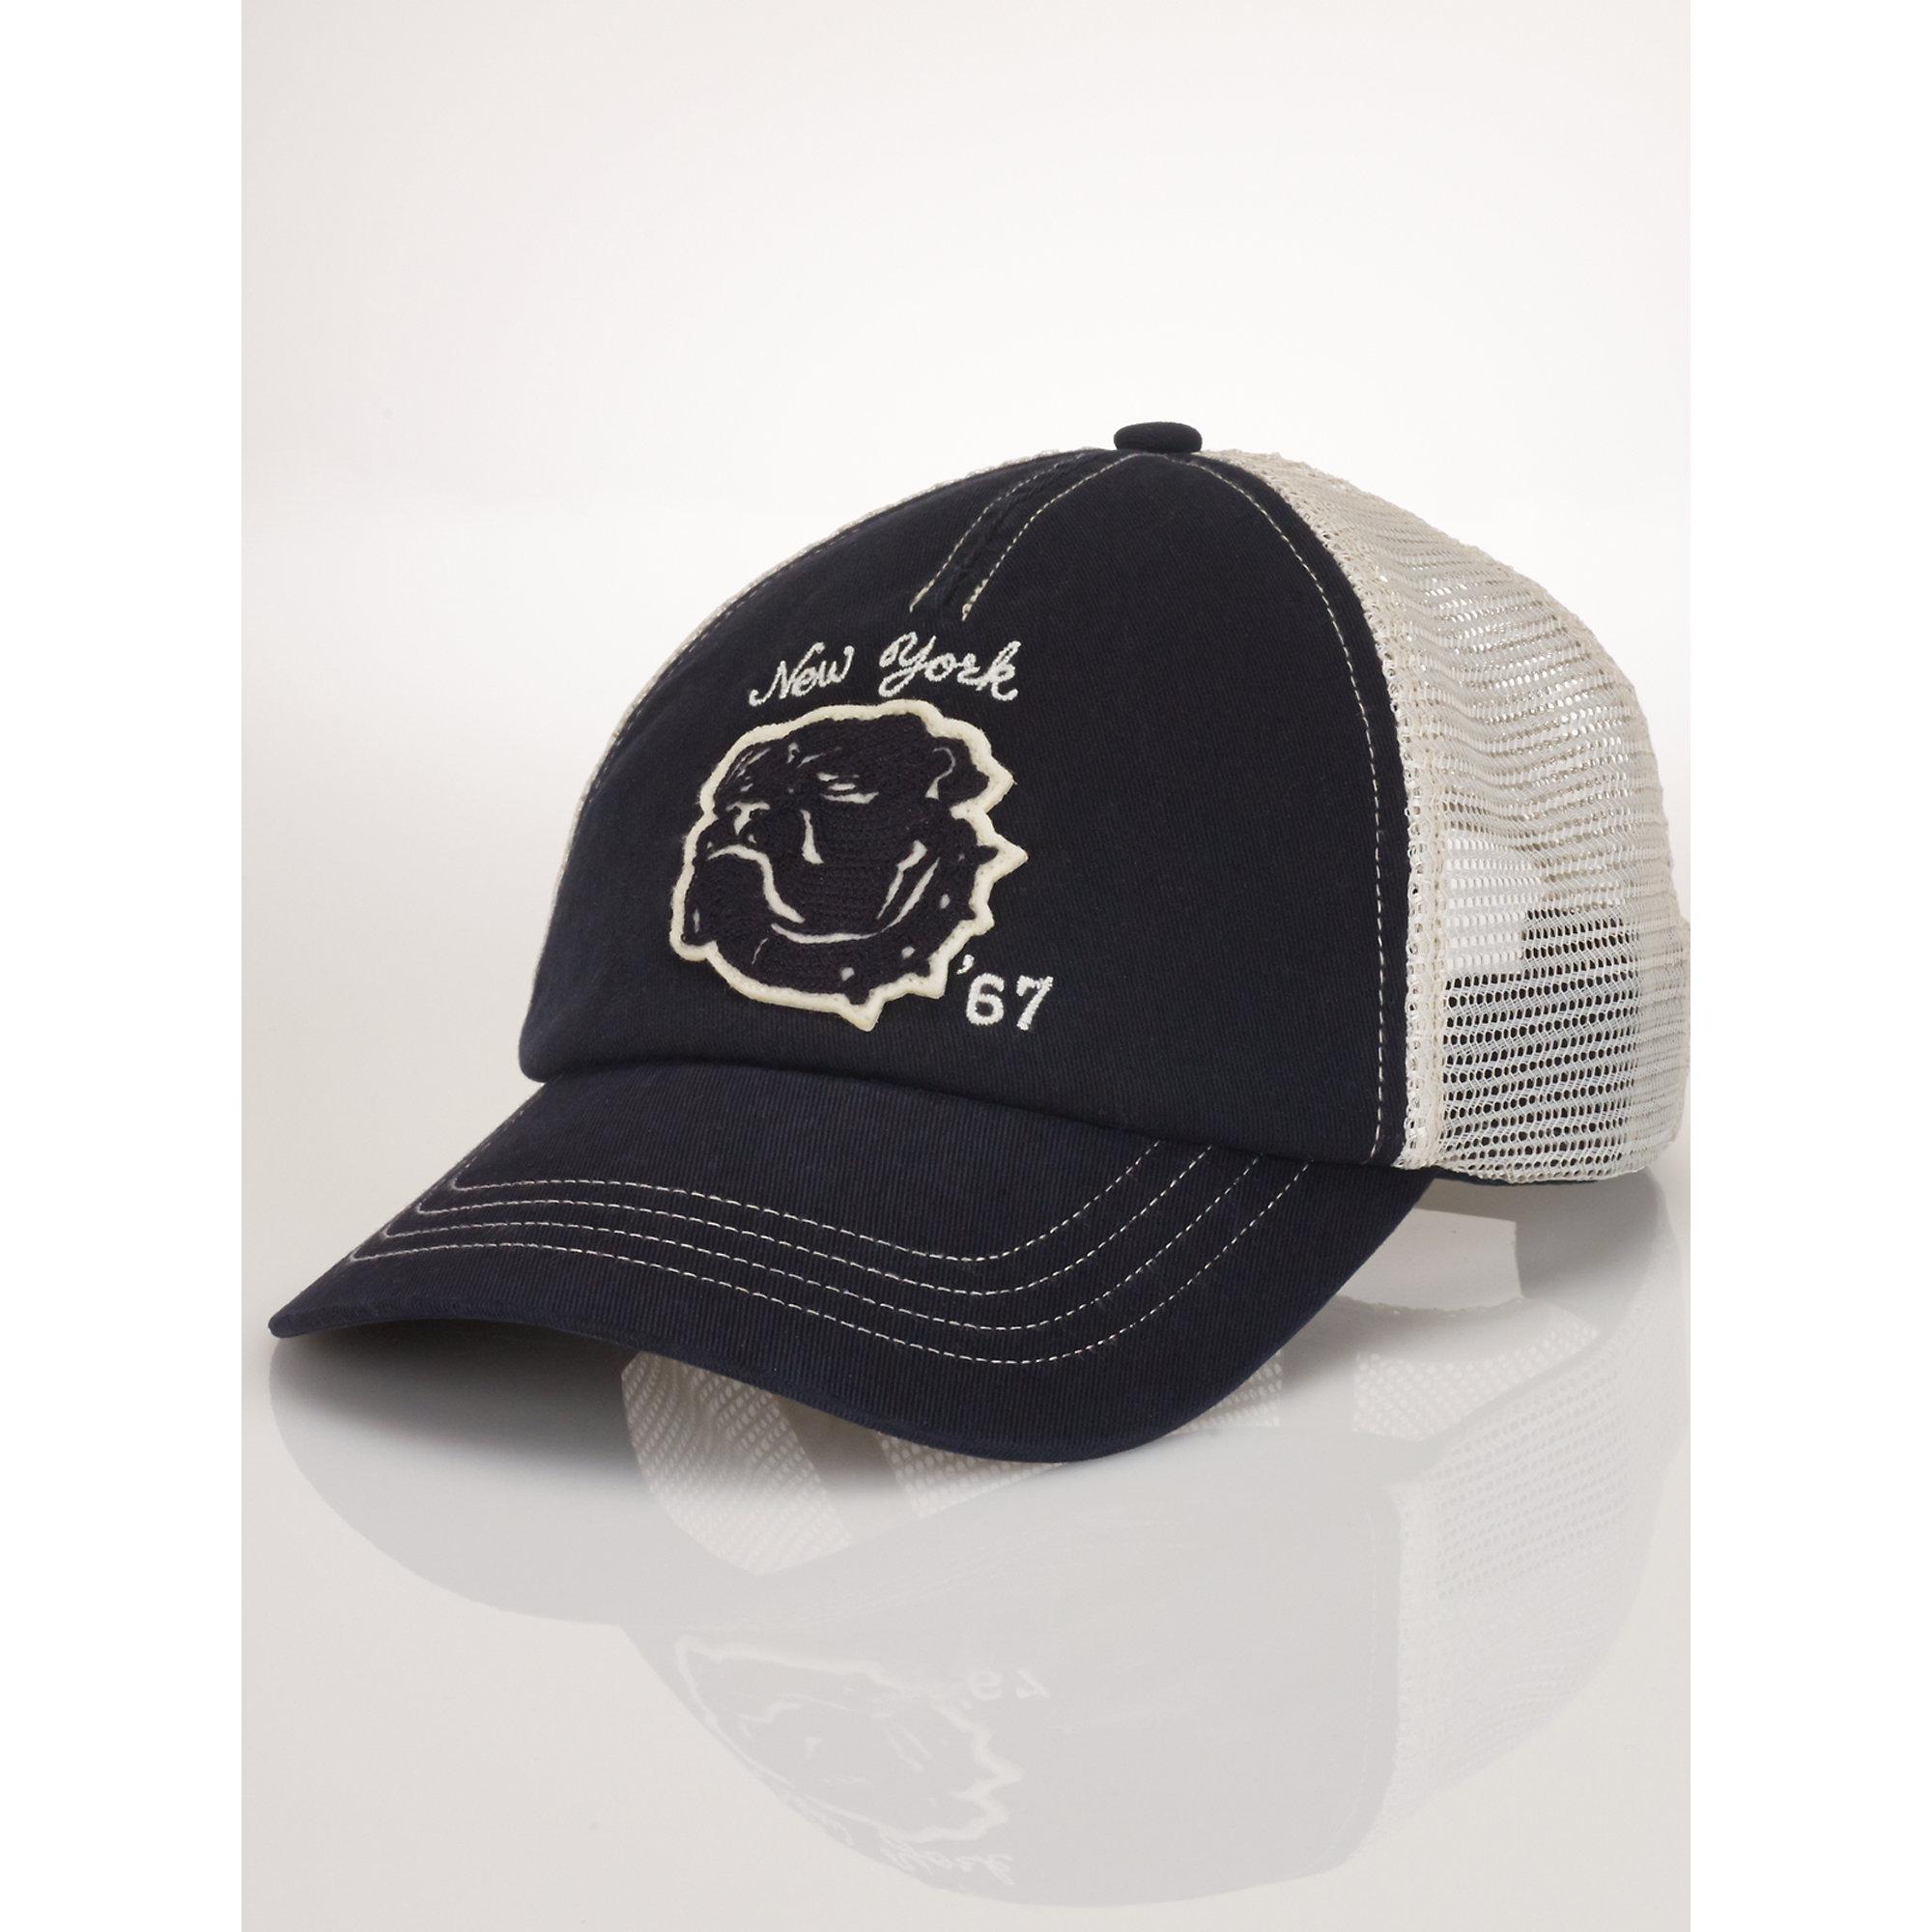 Lyst - Polo Ralph Lauren Mesh Utility Trucker Cap in Black for Men 1fa2368f154